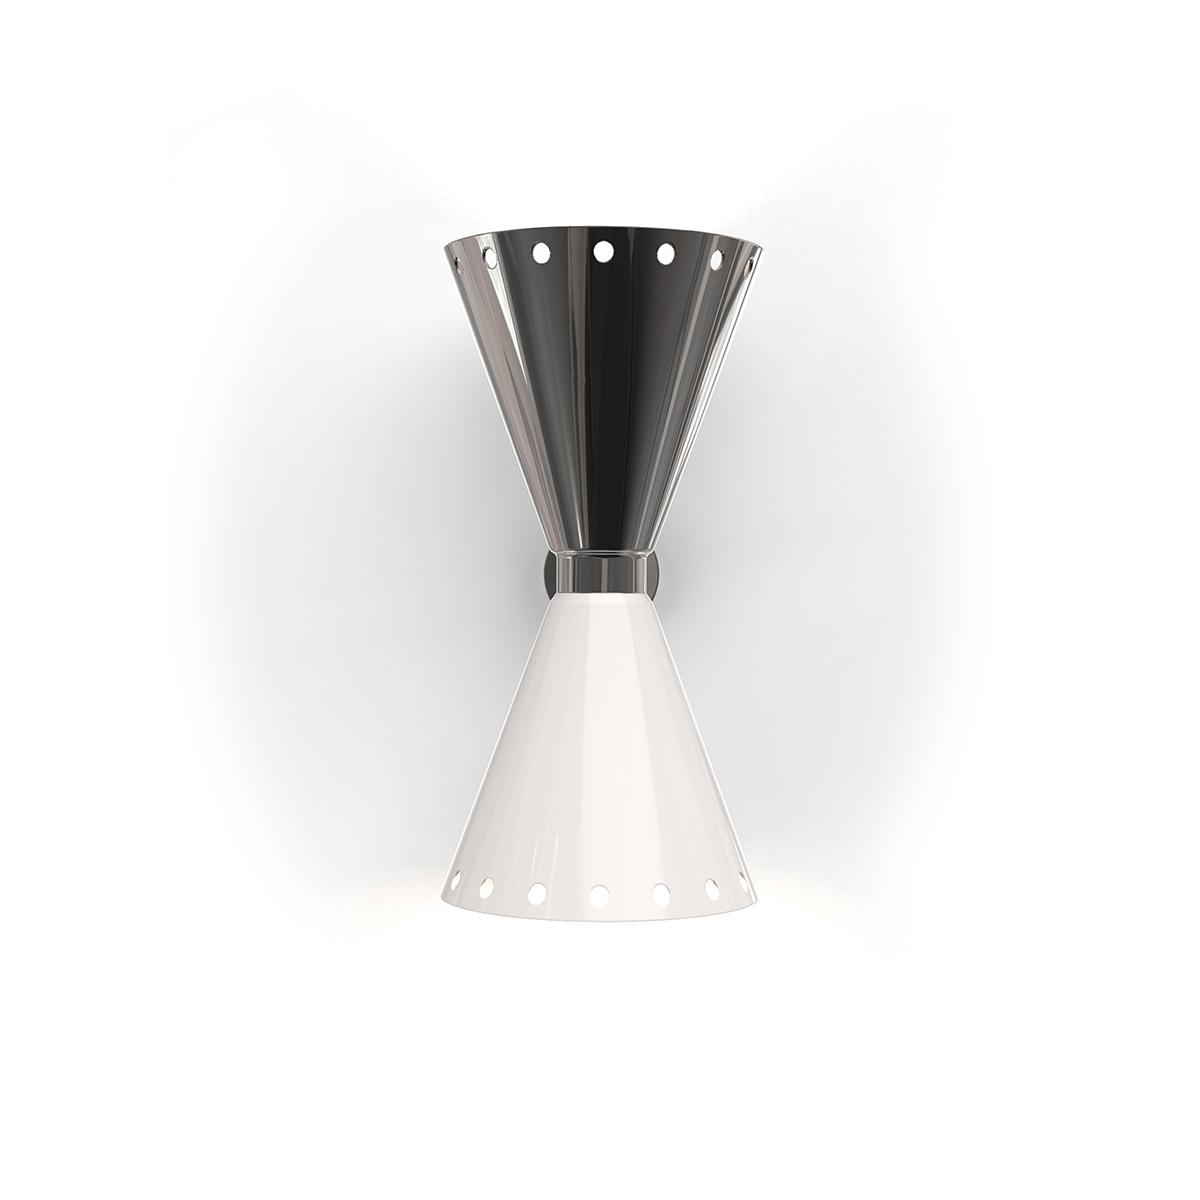 PIAZZOLLA WALL LAMP